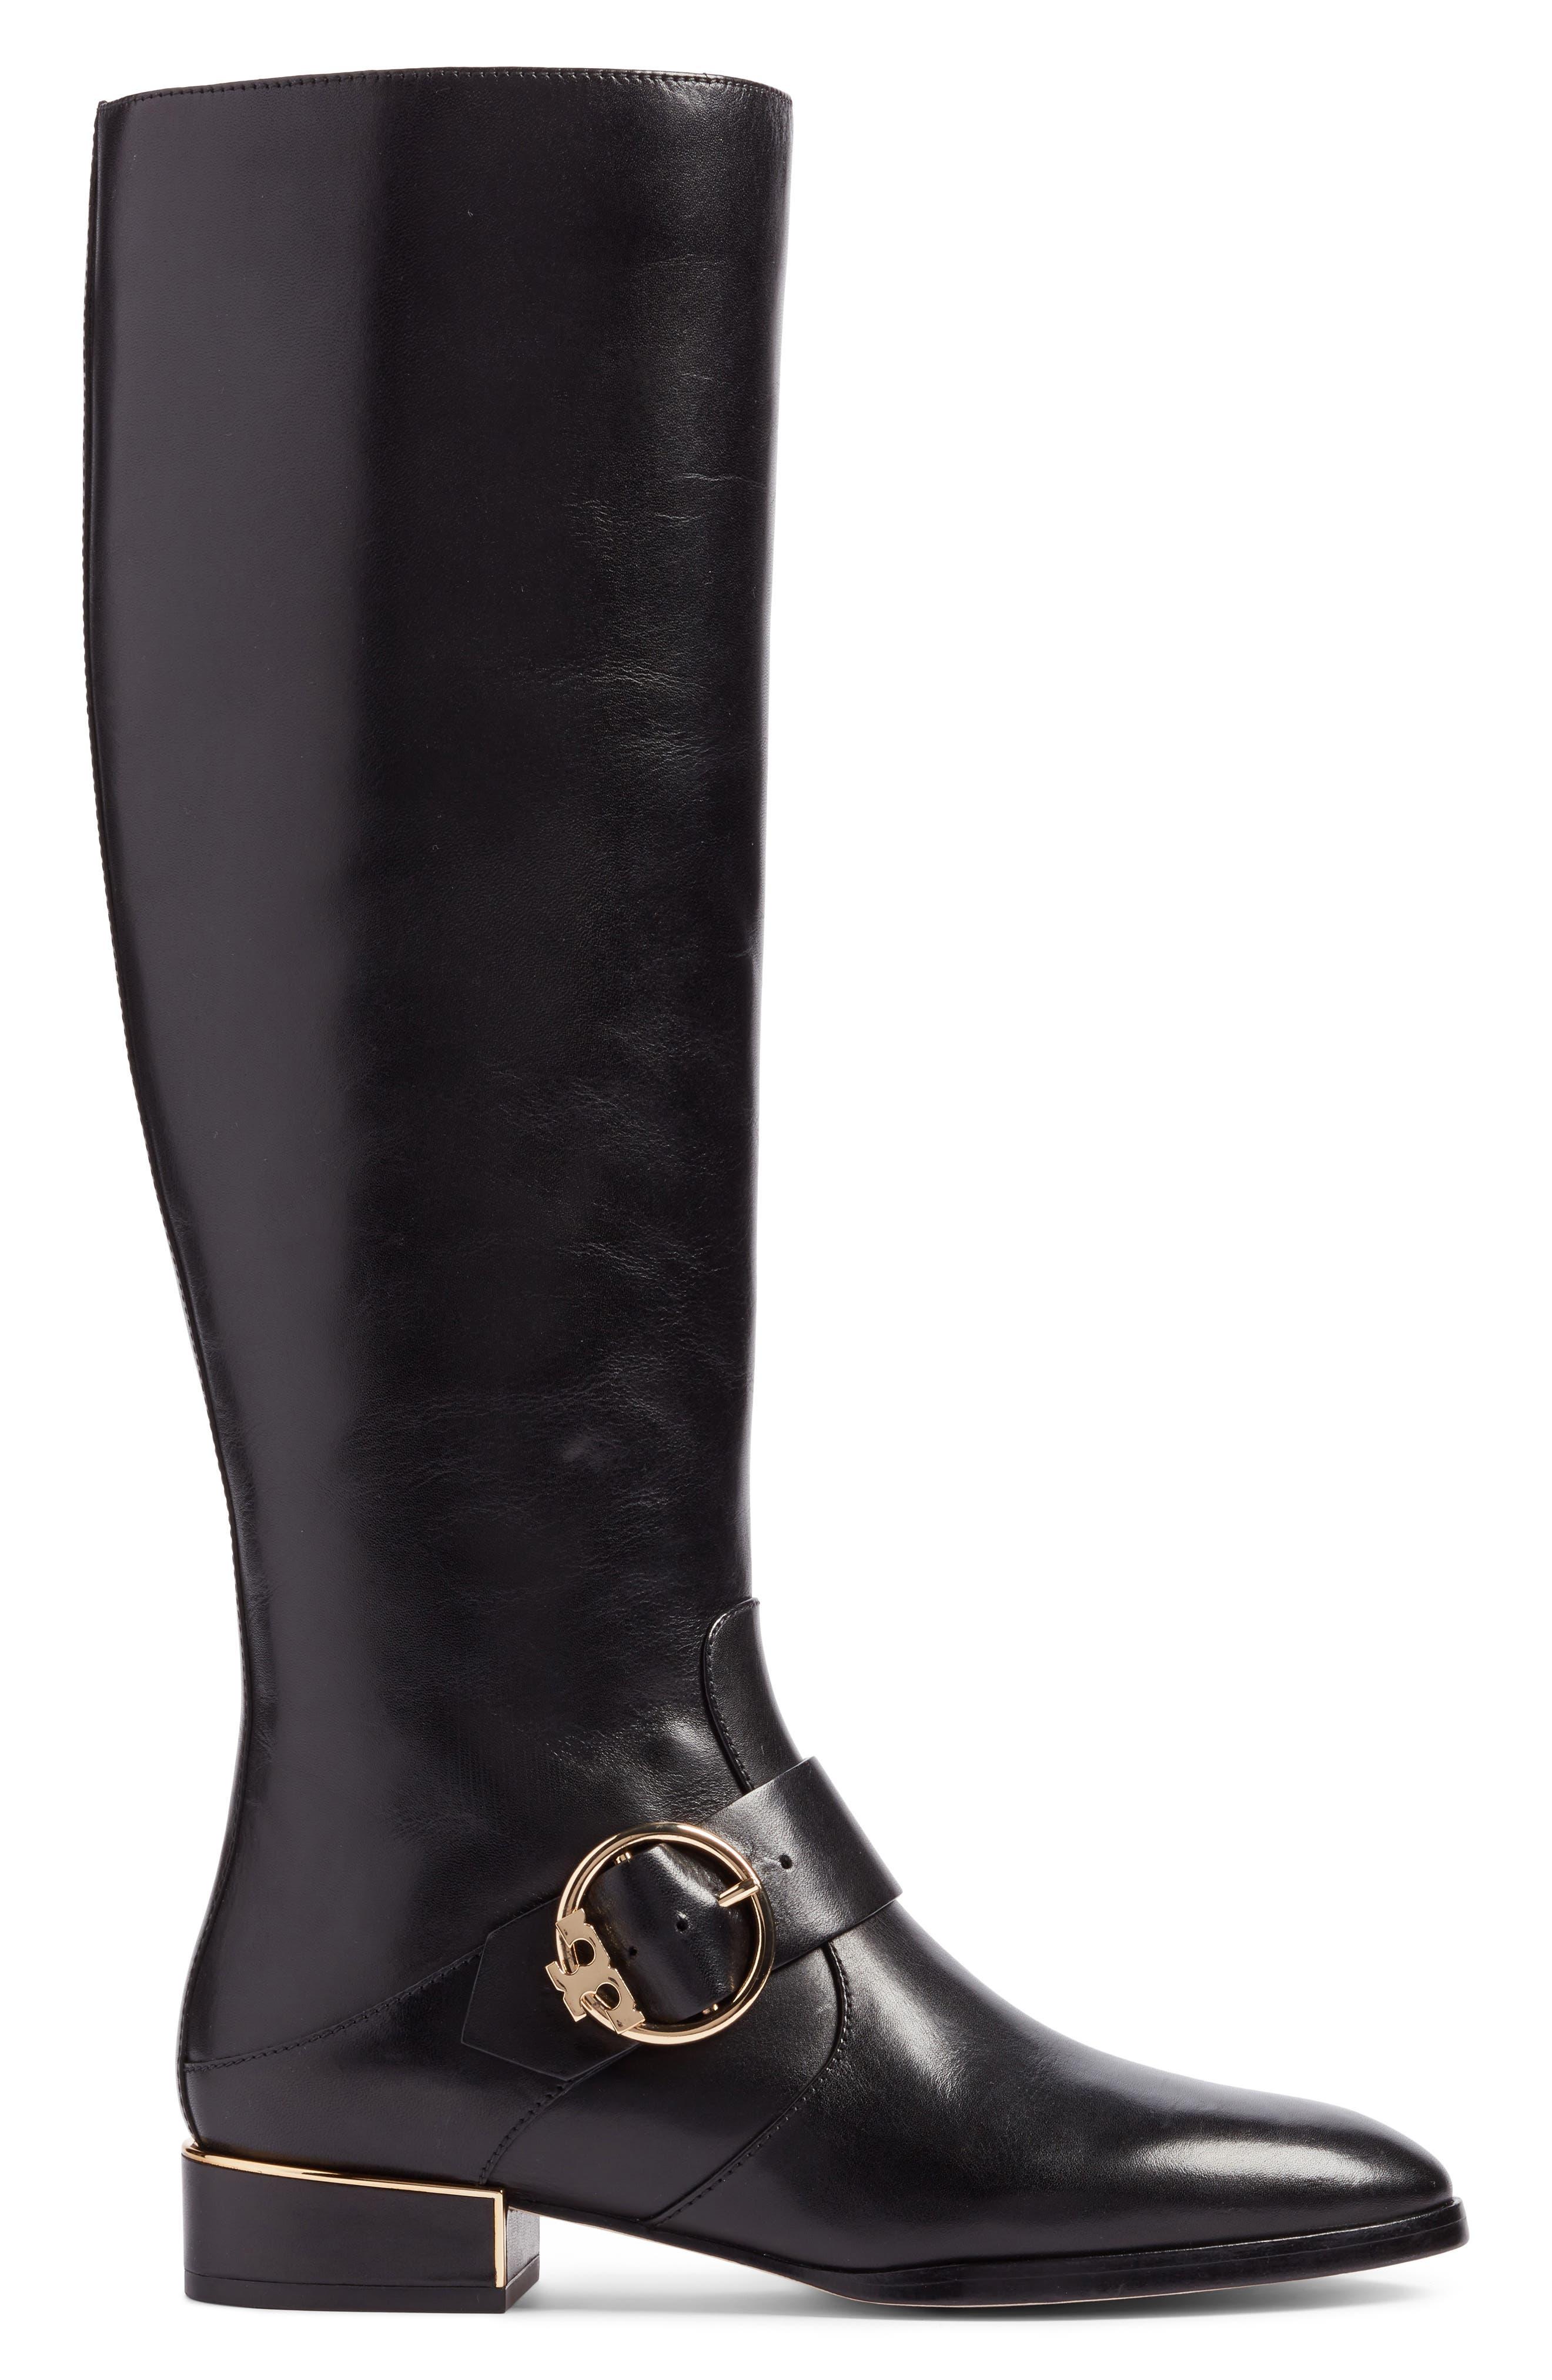 Alternate Image 3  - Tory Burch Sofia Buckled Riding Boot (Women) (Regular & Wide Calf)